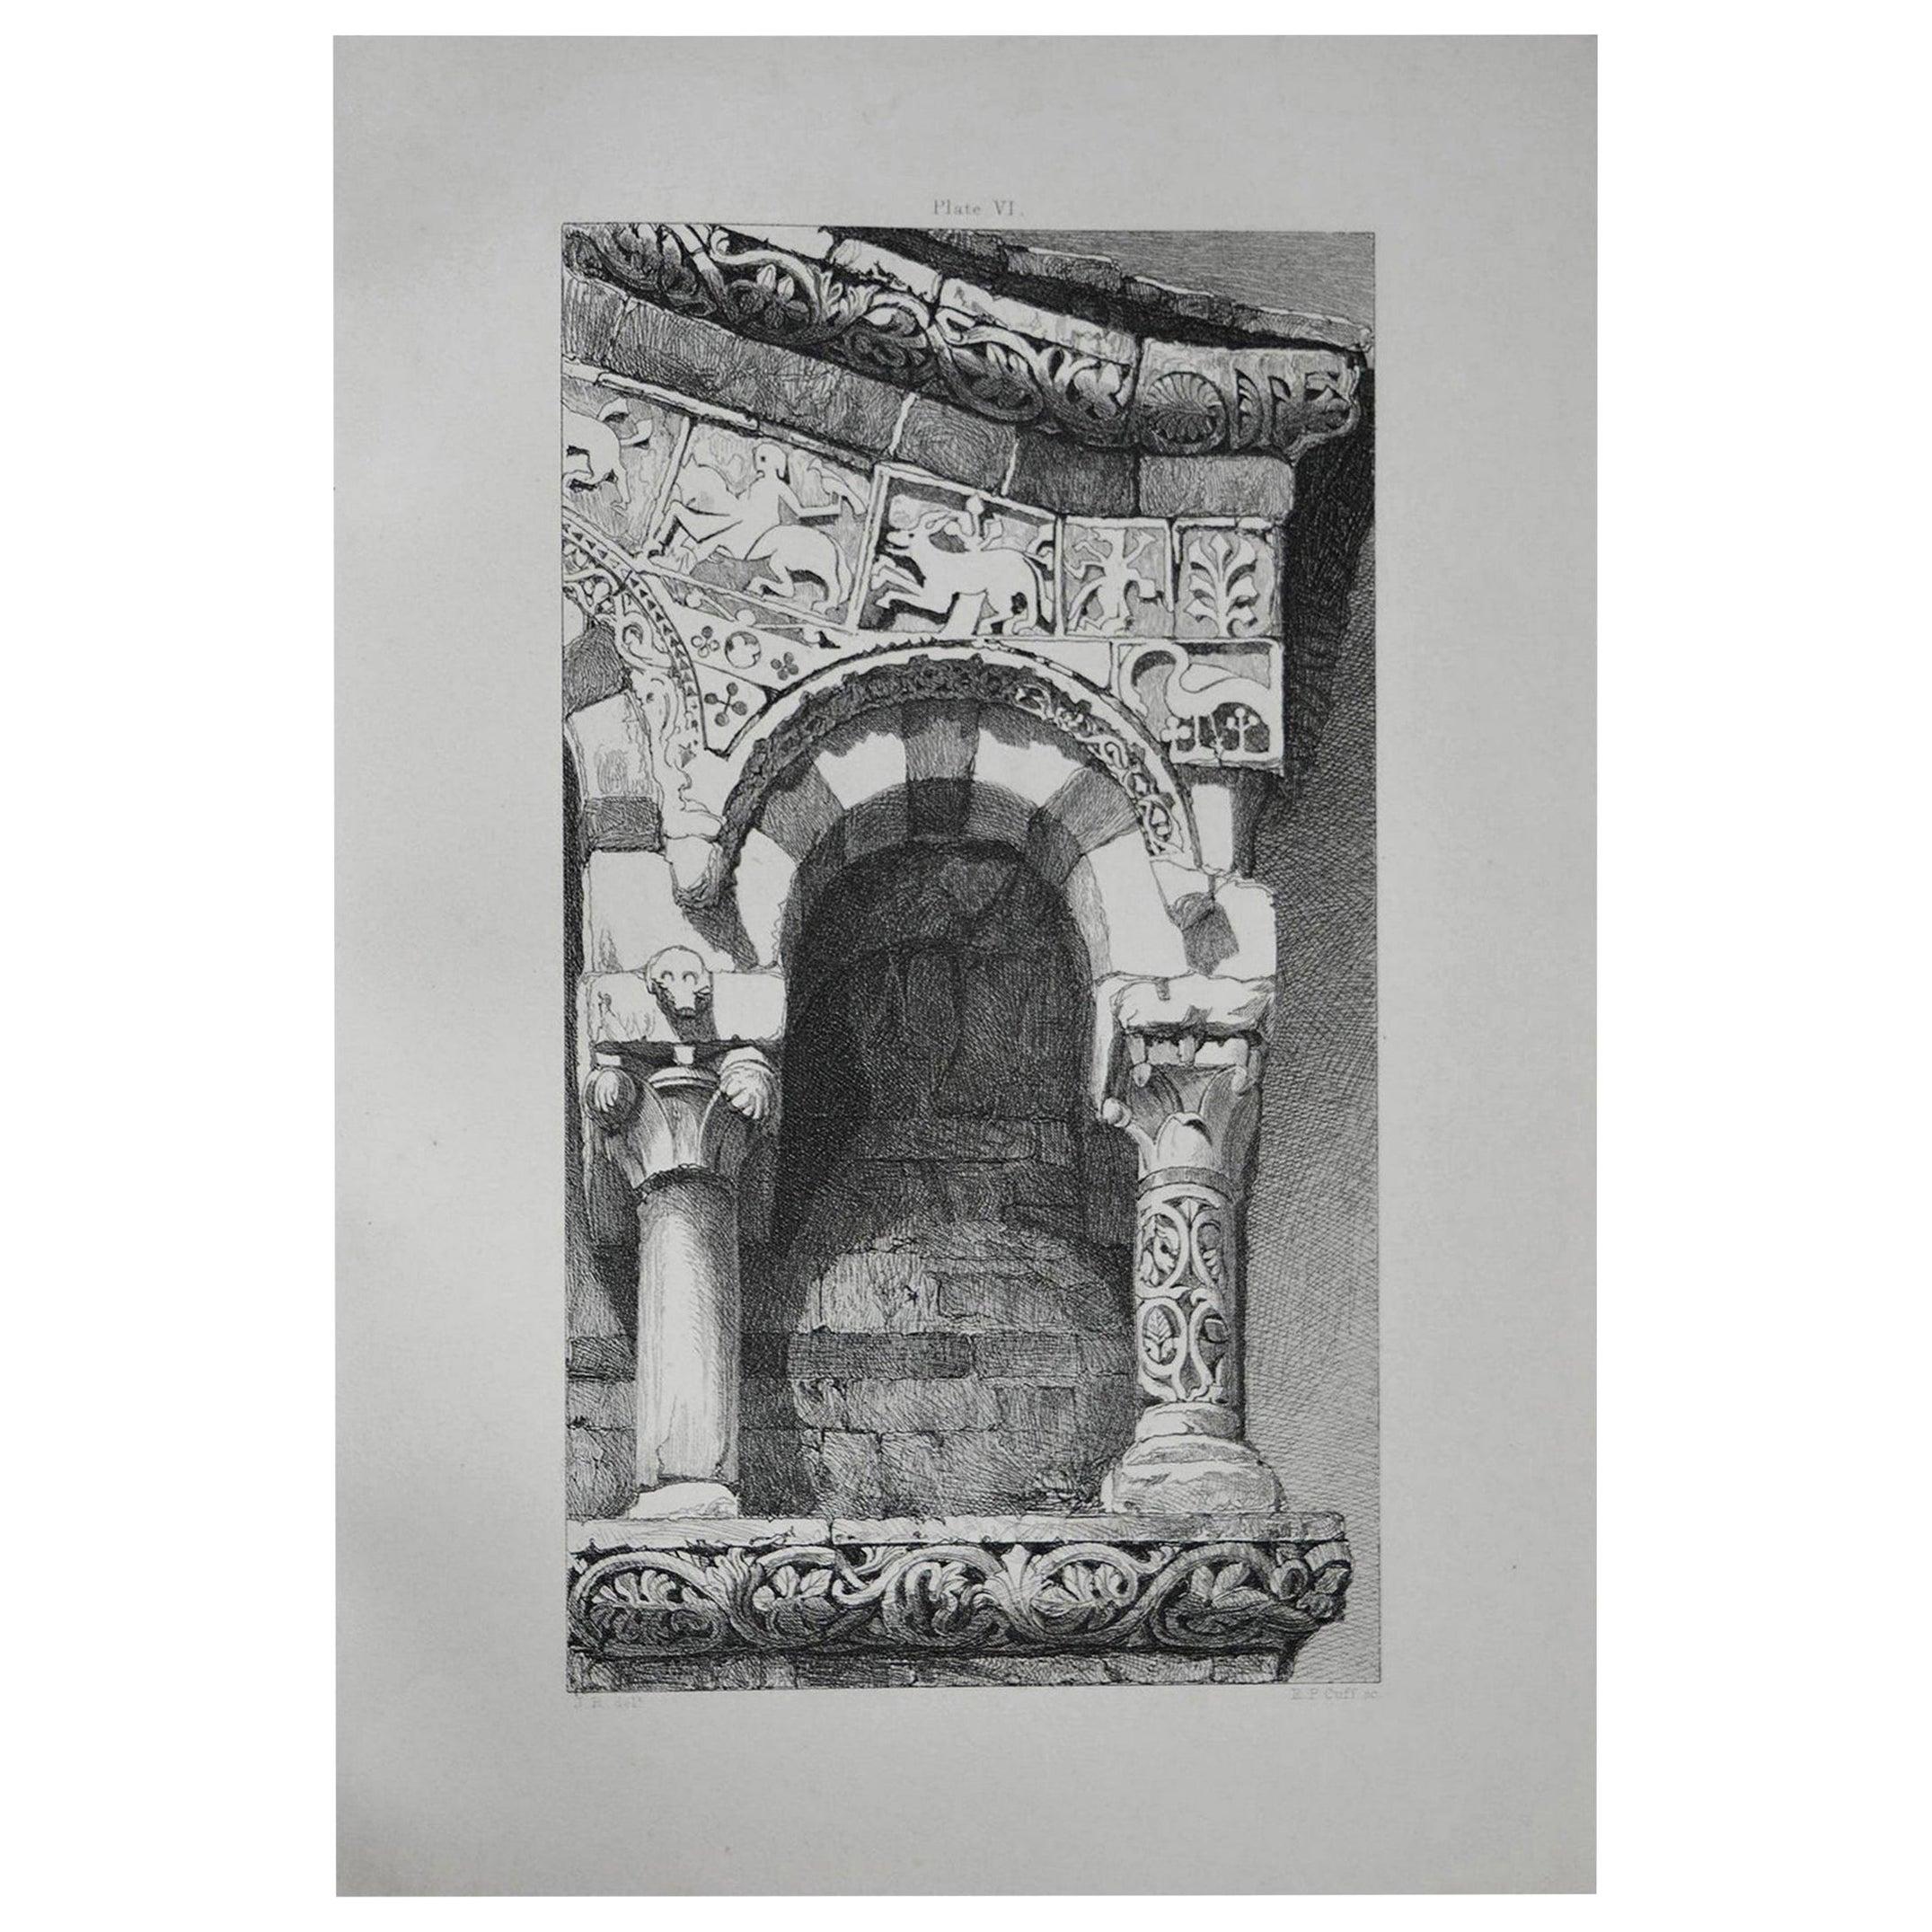 Original Antique Architectural Print by John Ruskin, circa 1880, 'Lucca'